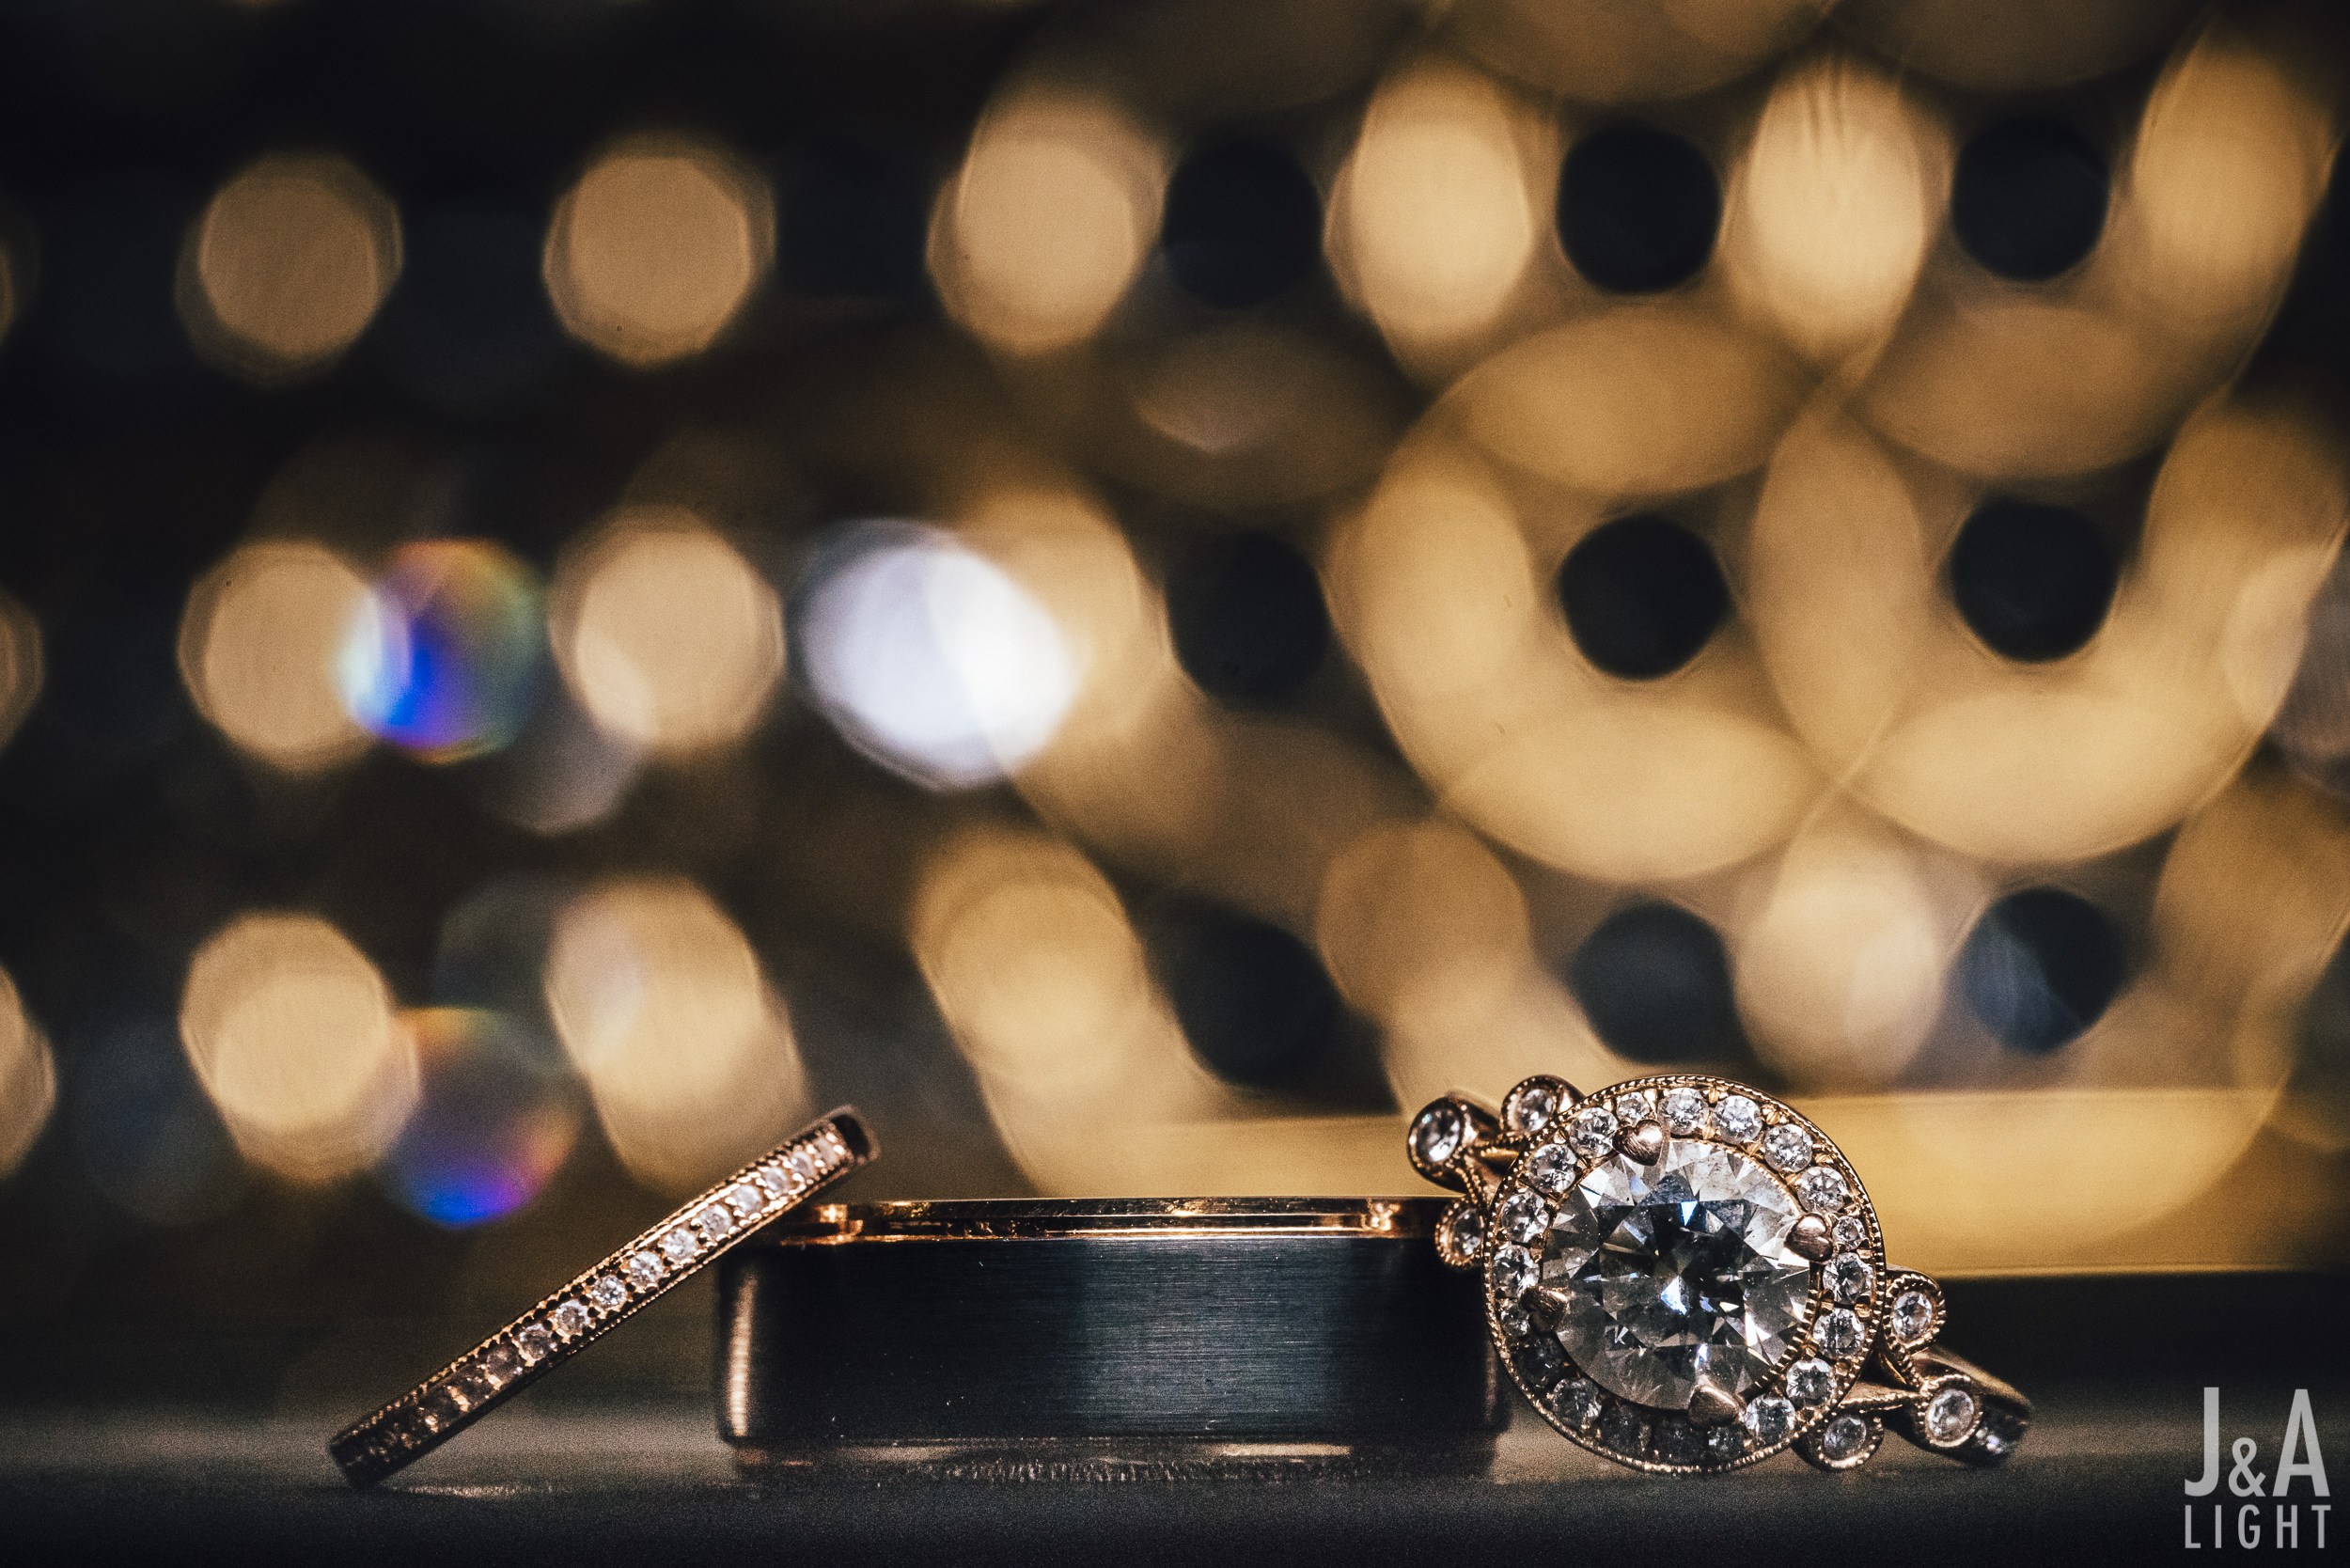 20171014-JanDan-LosBanos-GlassMansion-Wedding-Blog-096.jpg